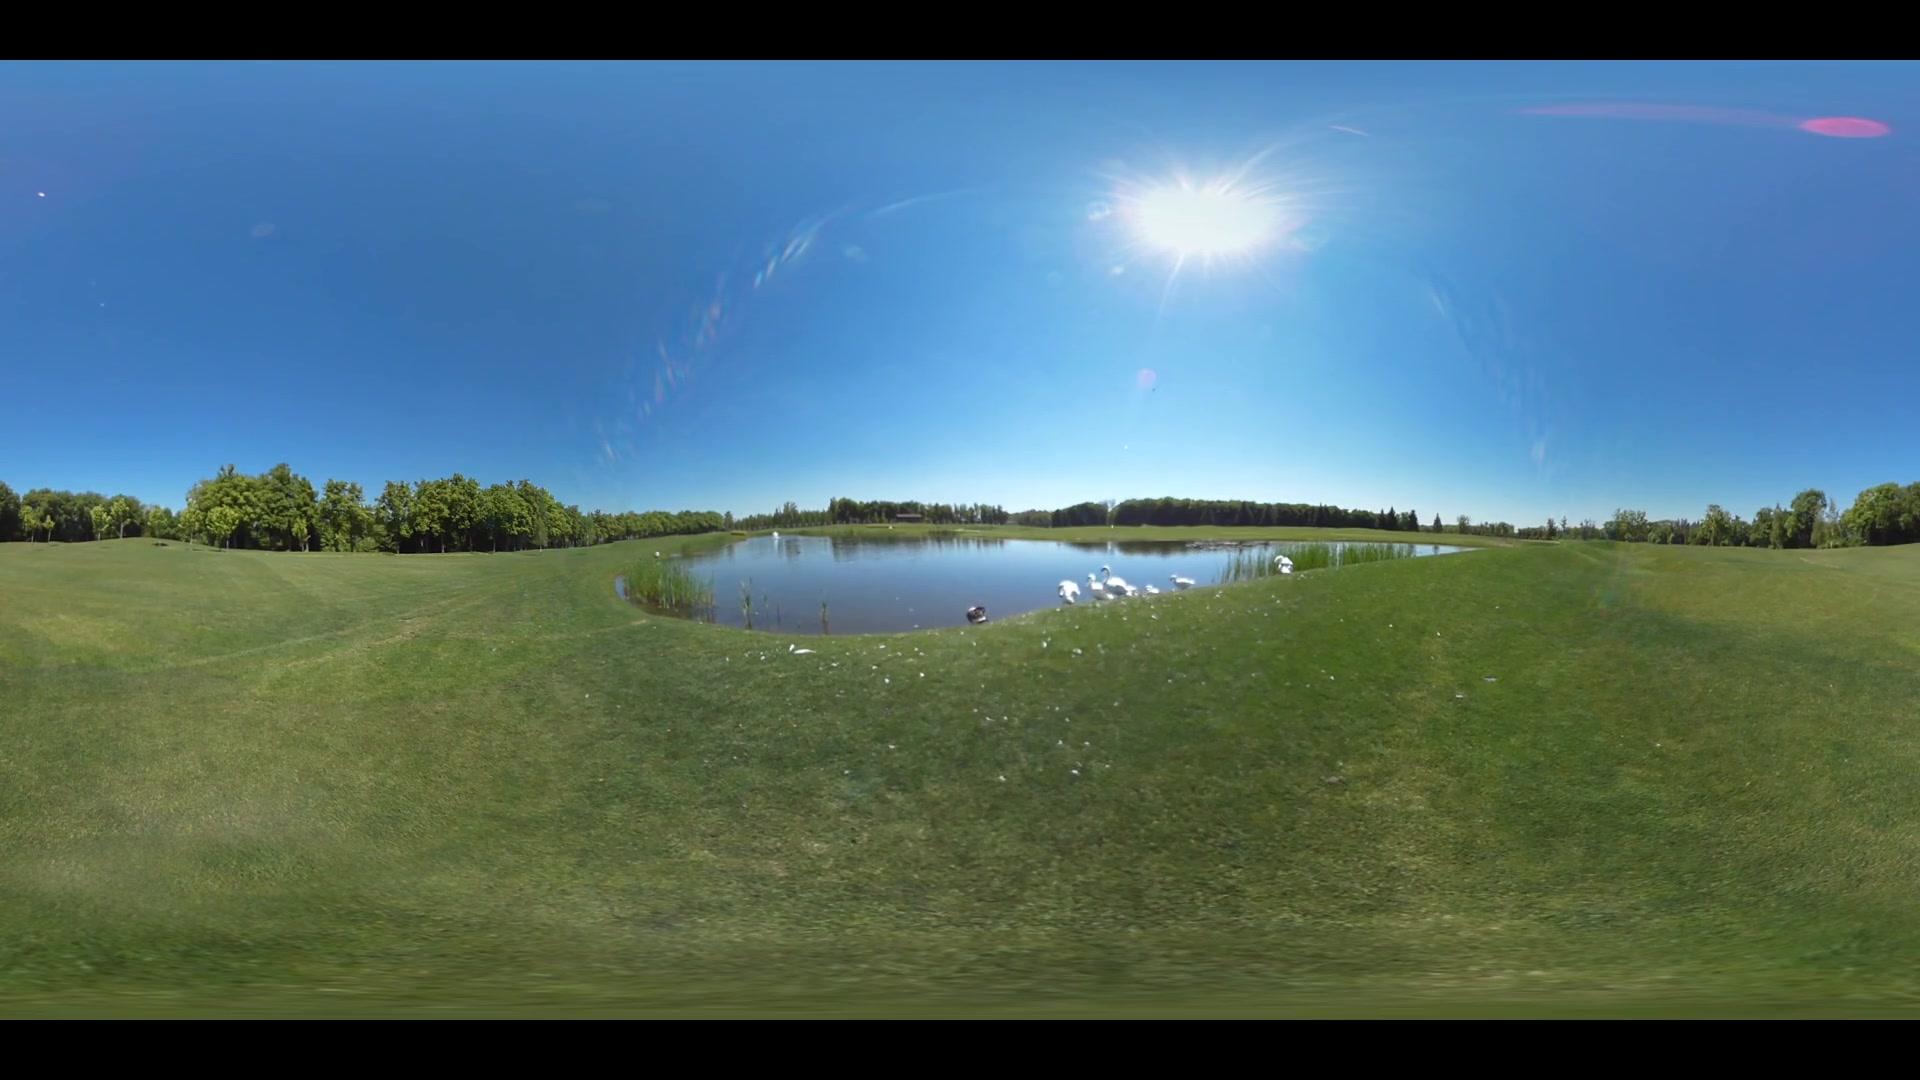 Green grass lake panoramic view. White swan on lake shore 360 degree panorama. Pond grass field panorama 360 view. Beautiful nature lake swan. Pond grass landscape